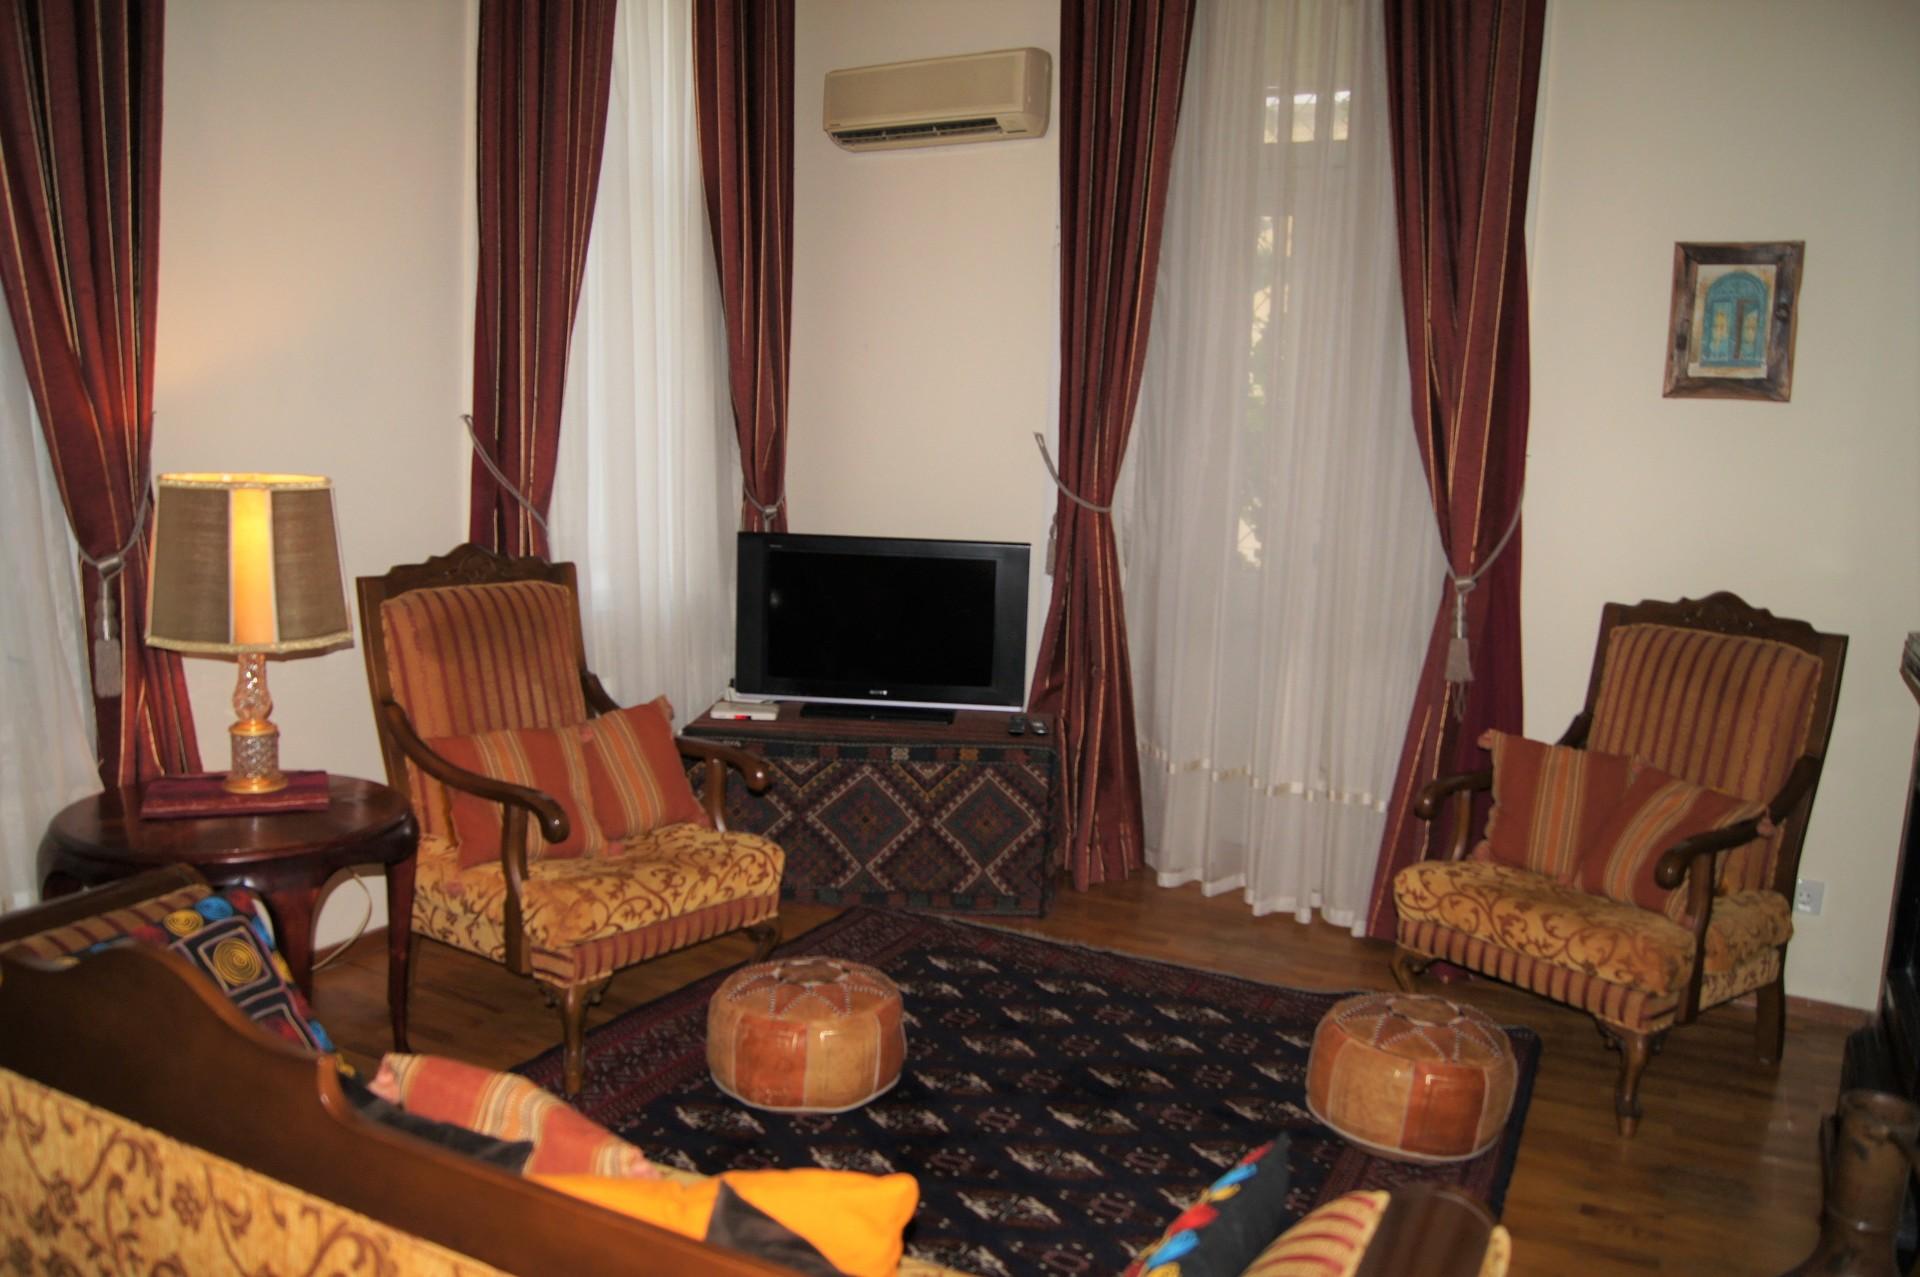 sunny-3-bedrooms-apt-city-center-baku-2c